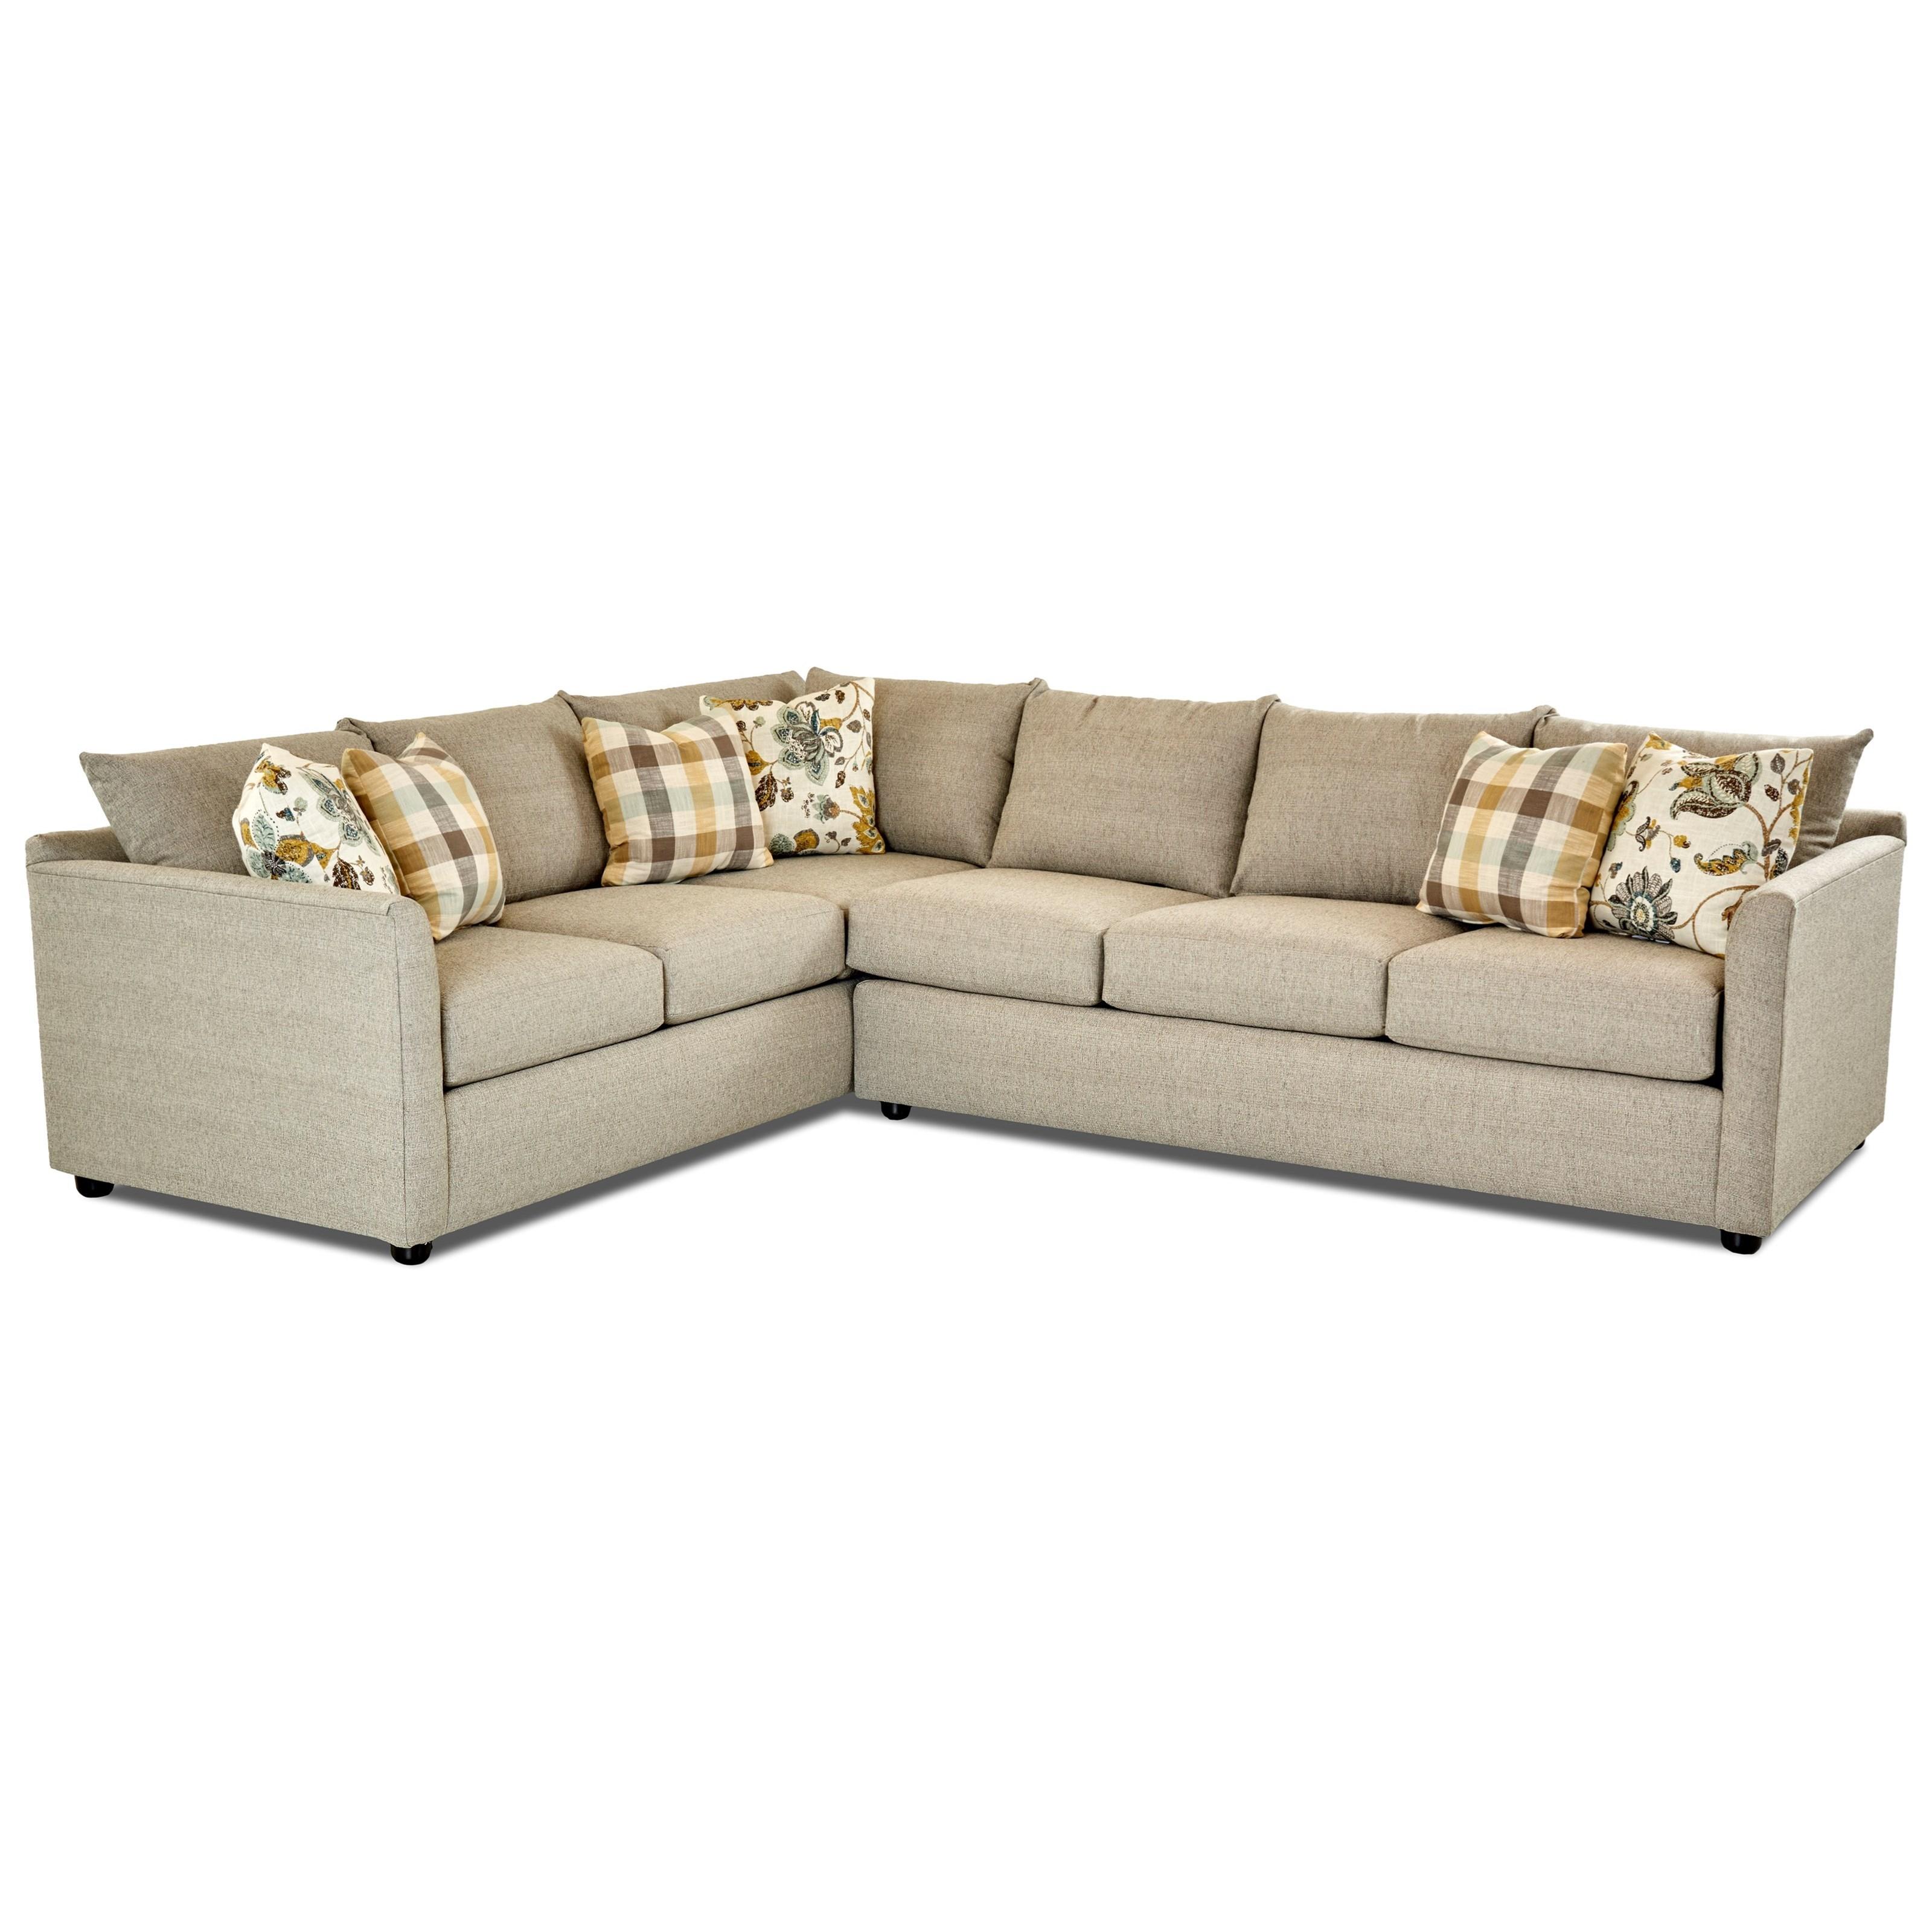 Trisha Yearwood Home Collection By Klaussner AtlantaSectional Sofa